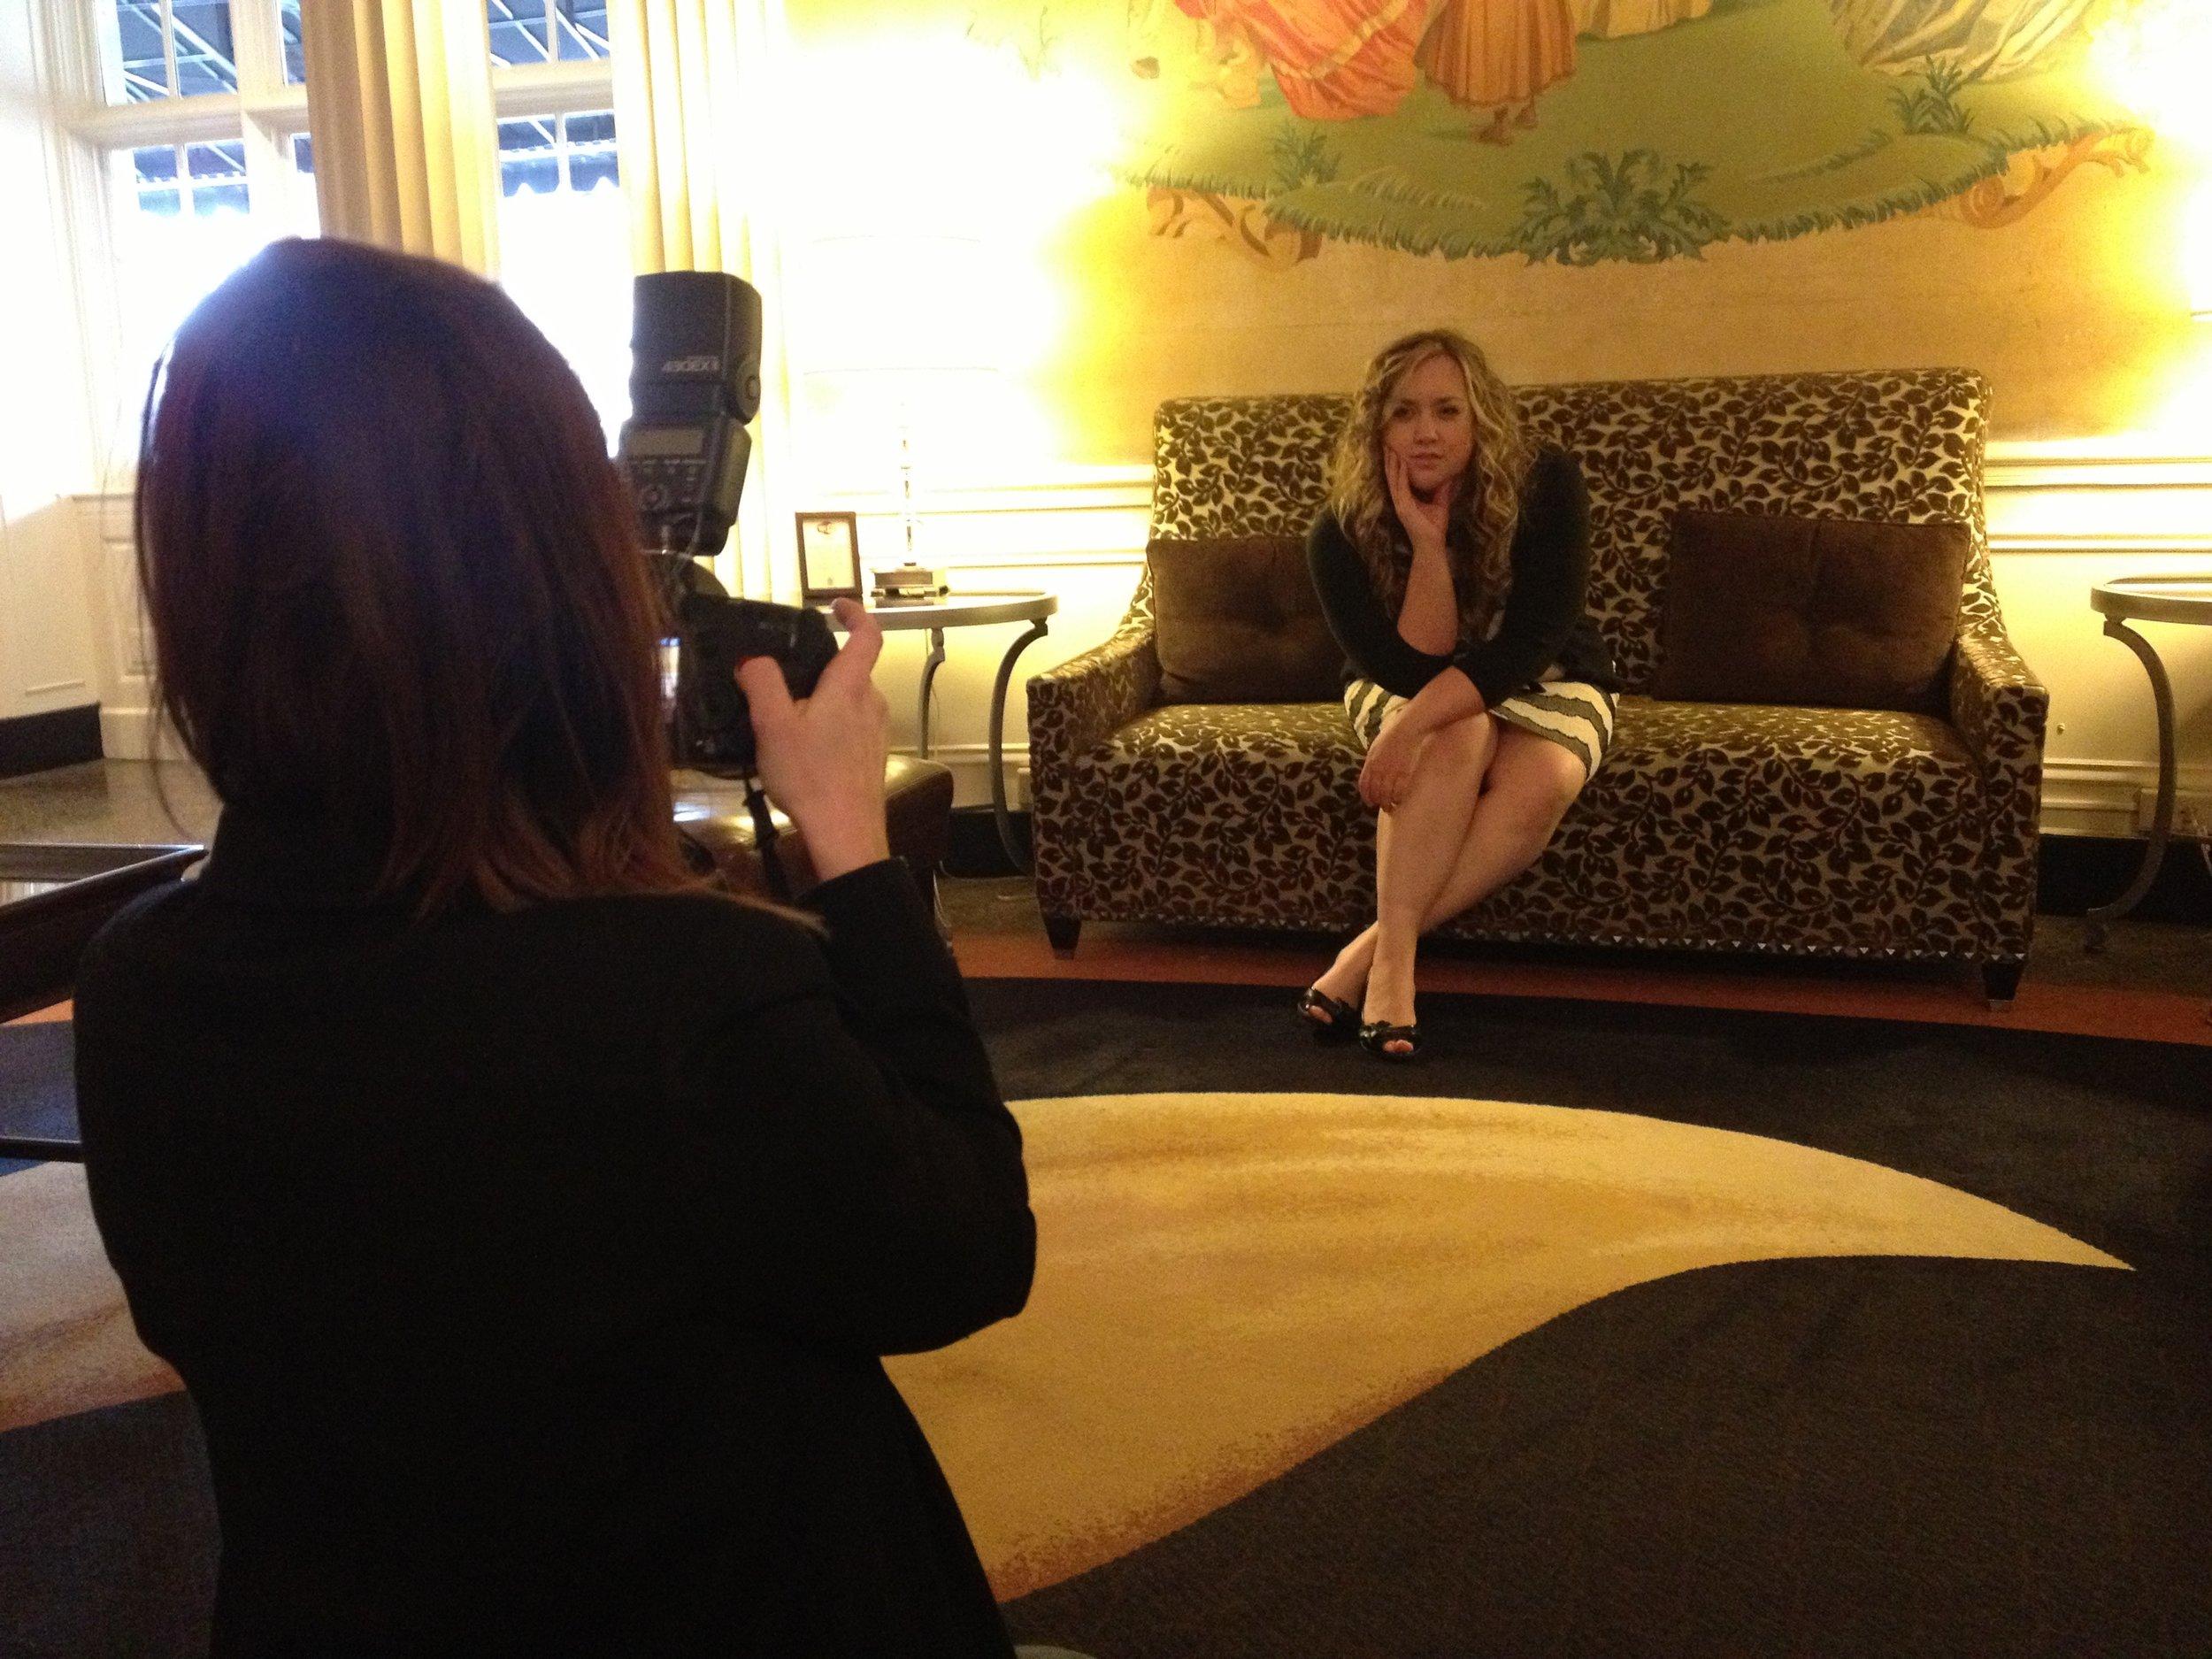 Amy Cox Hotel Roanoke Photo Shoot Behind the Scenes.jpg